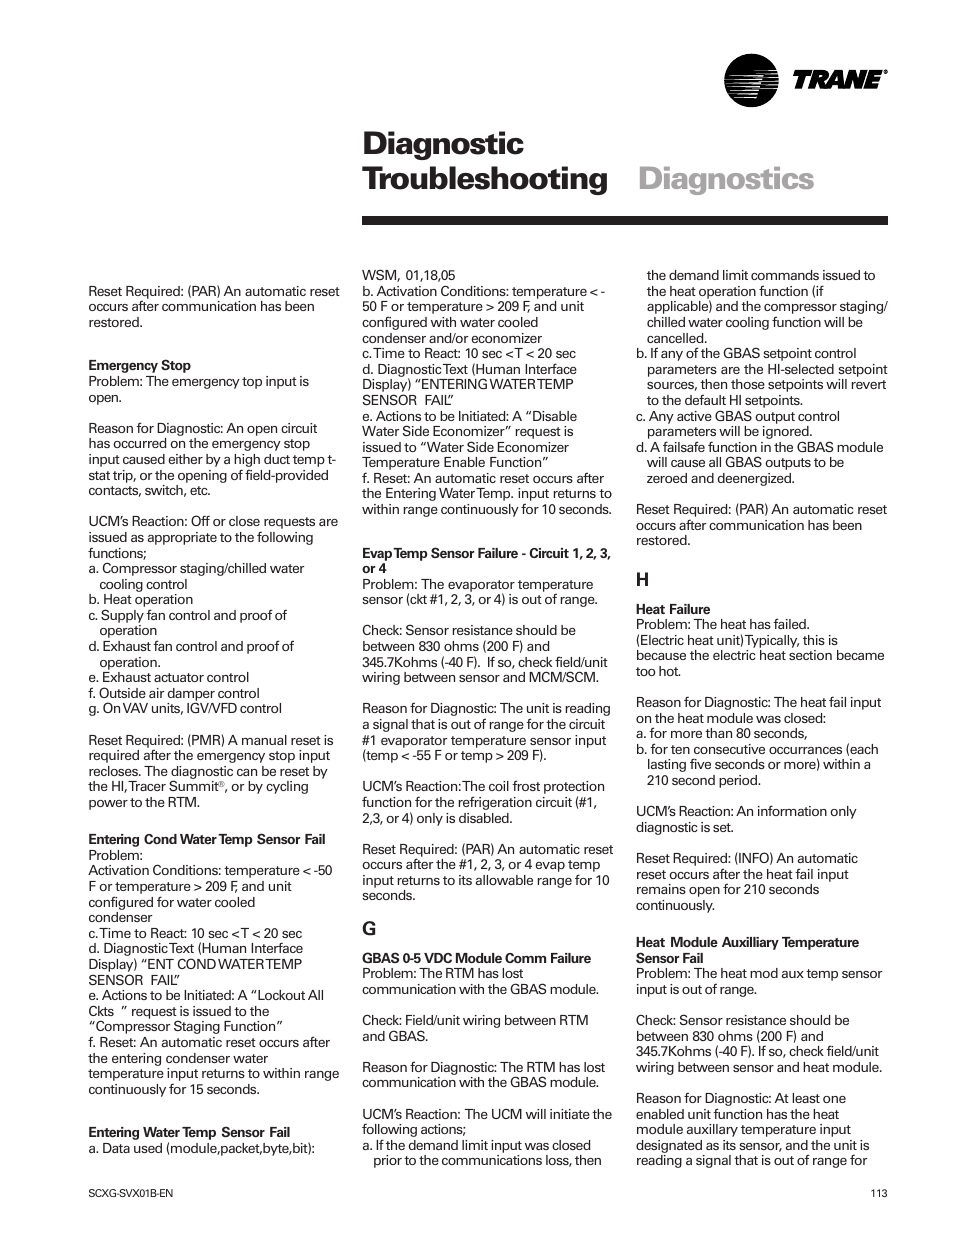 diagnostic troubleshooting diagnostics trane intellipak scwg 020 rh manualsdir com DSM 4 Online DSM to the Scientific Basis